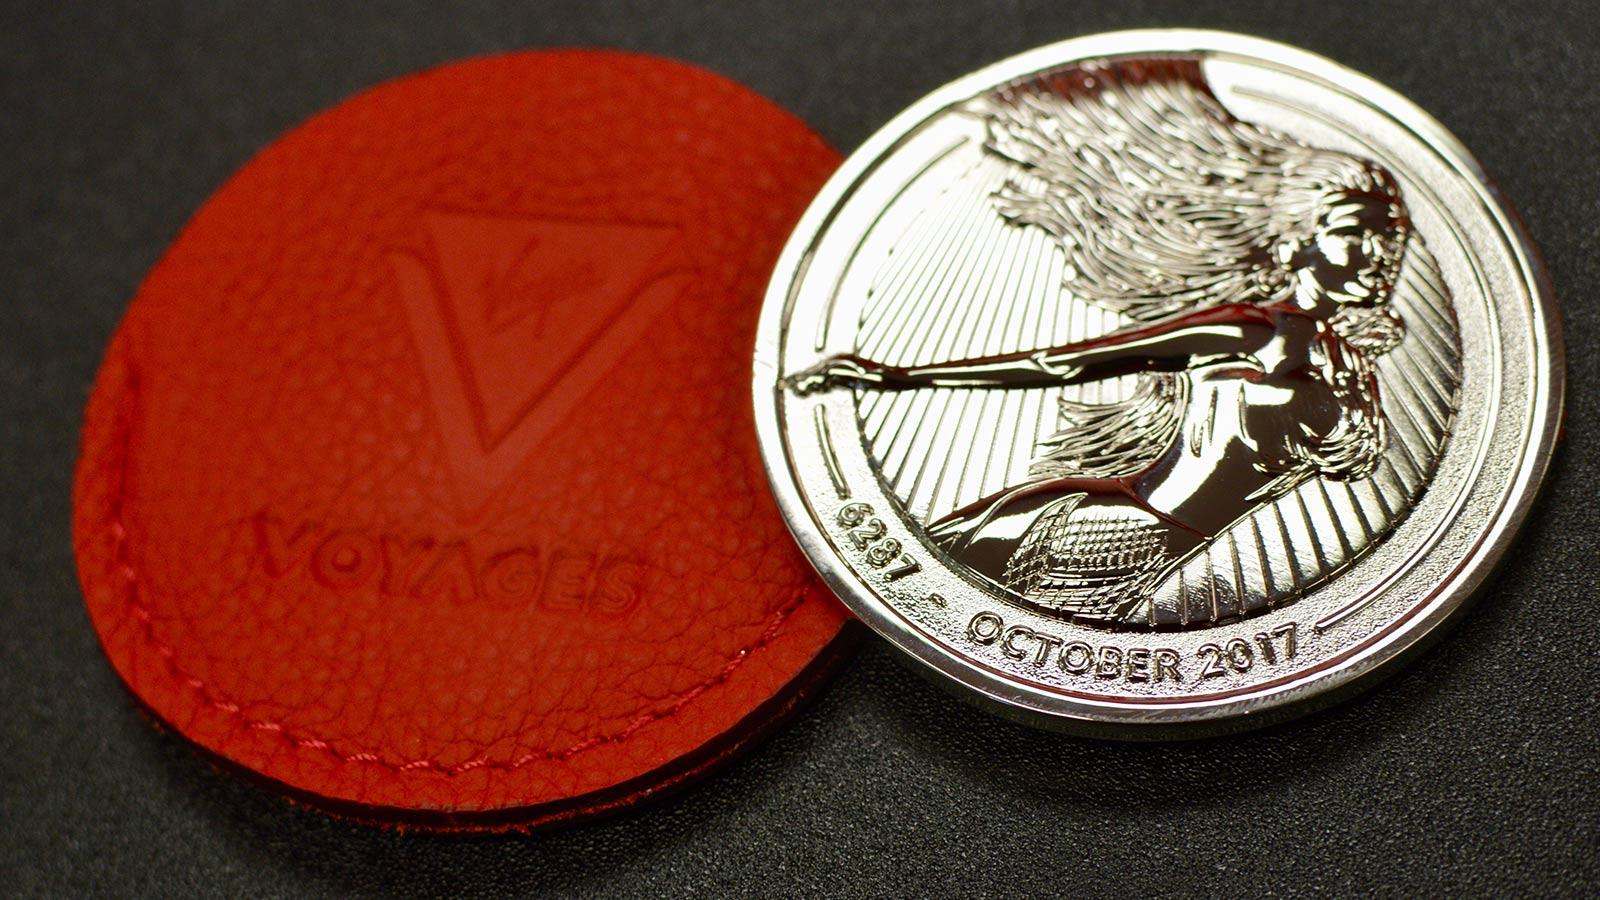 Ship keellaying coin